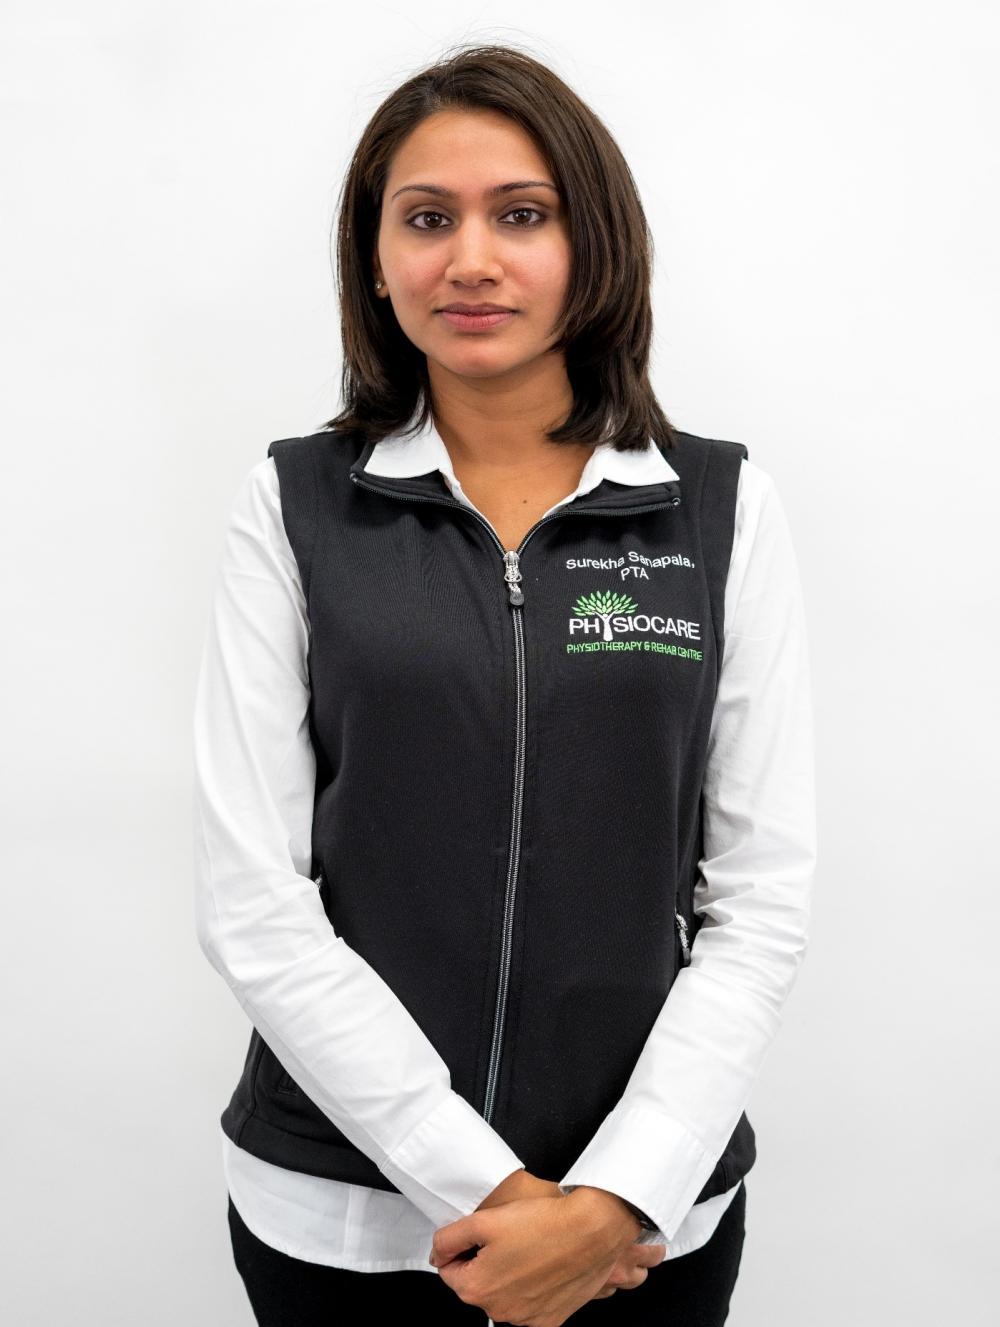 Surekha Sanapala